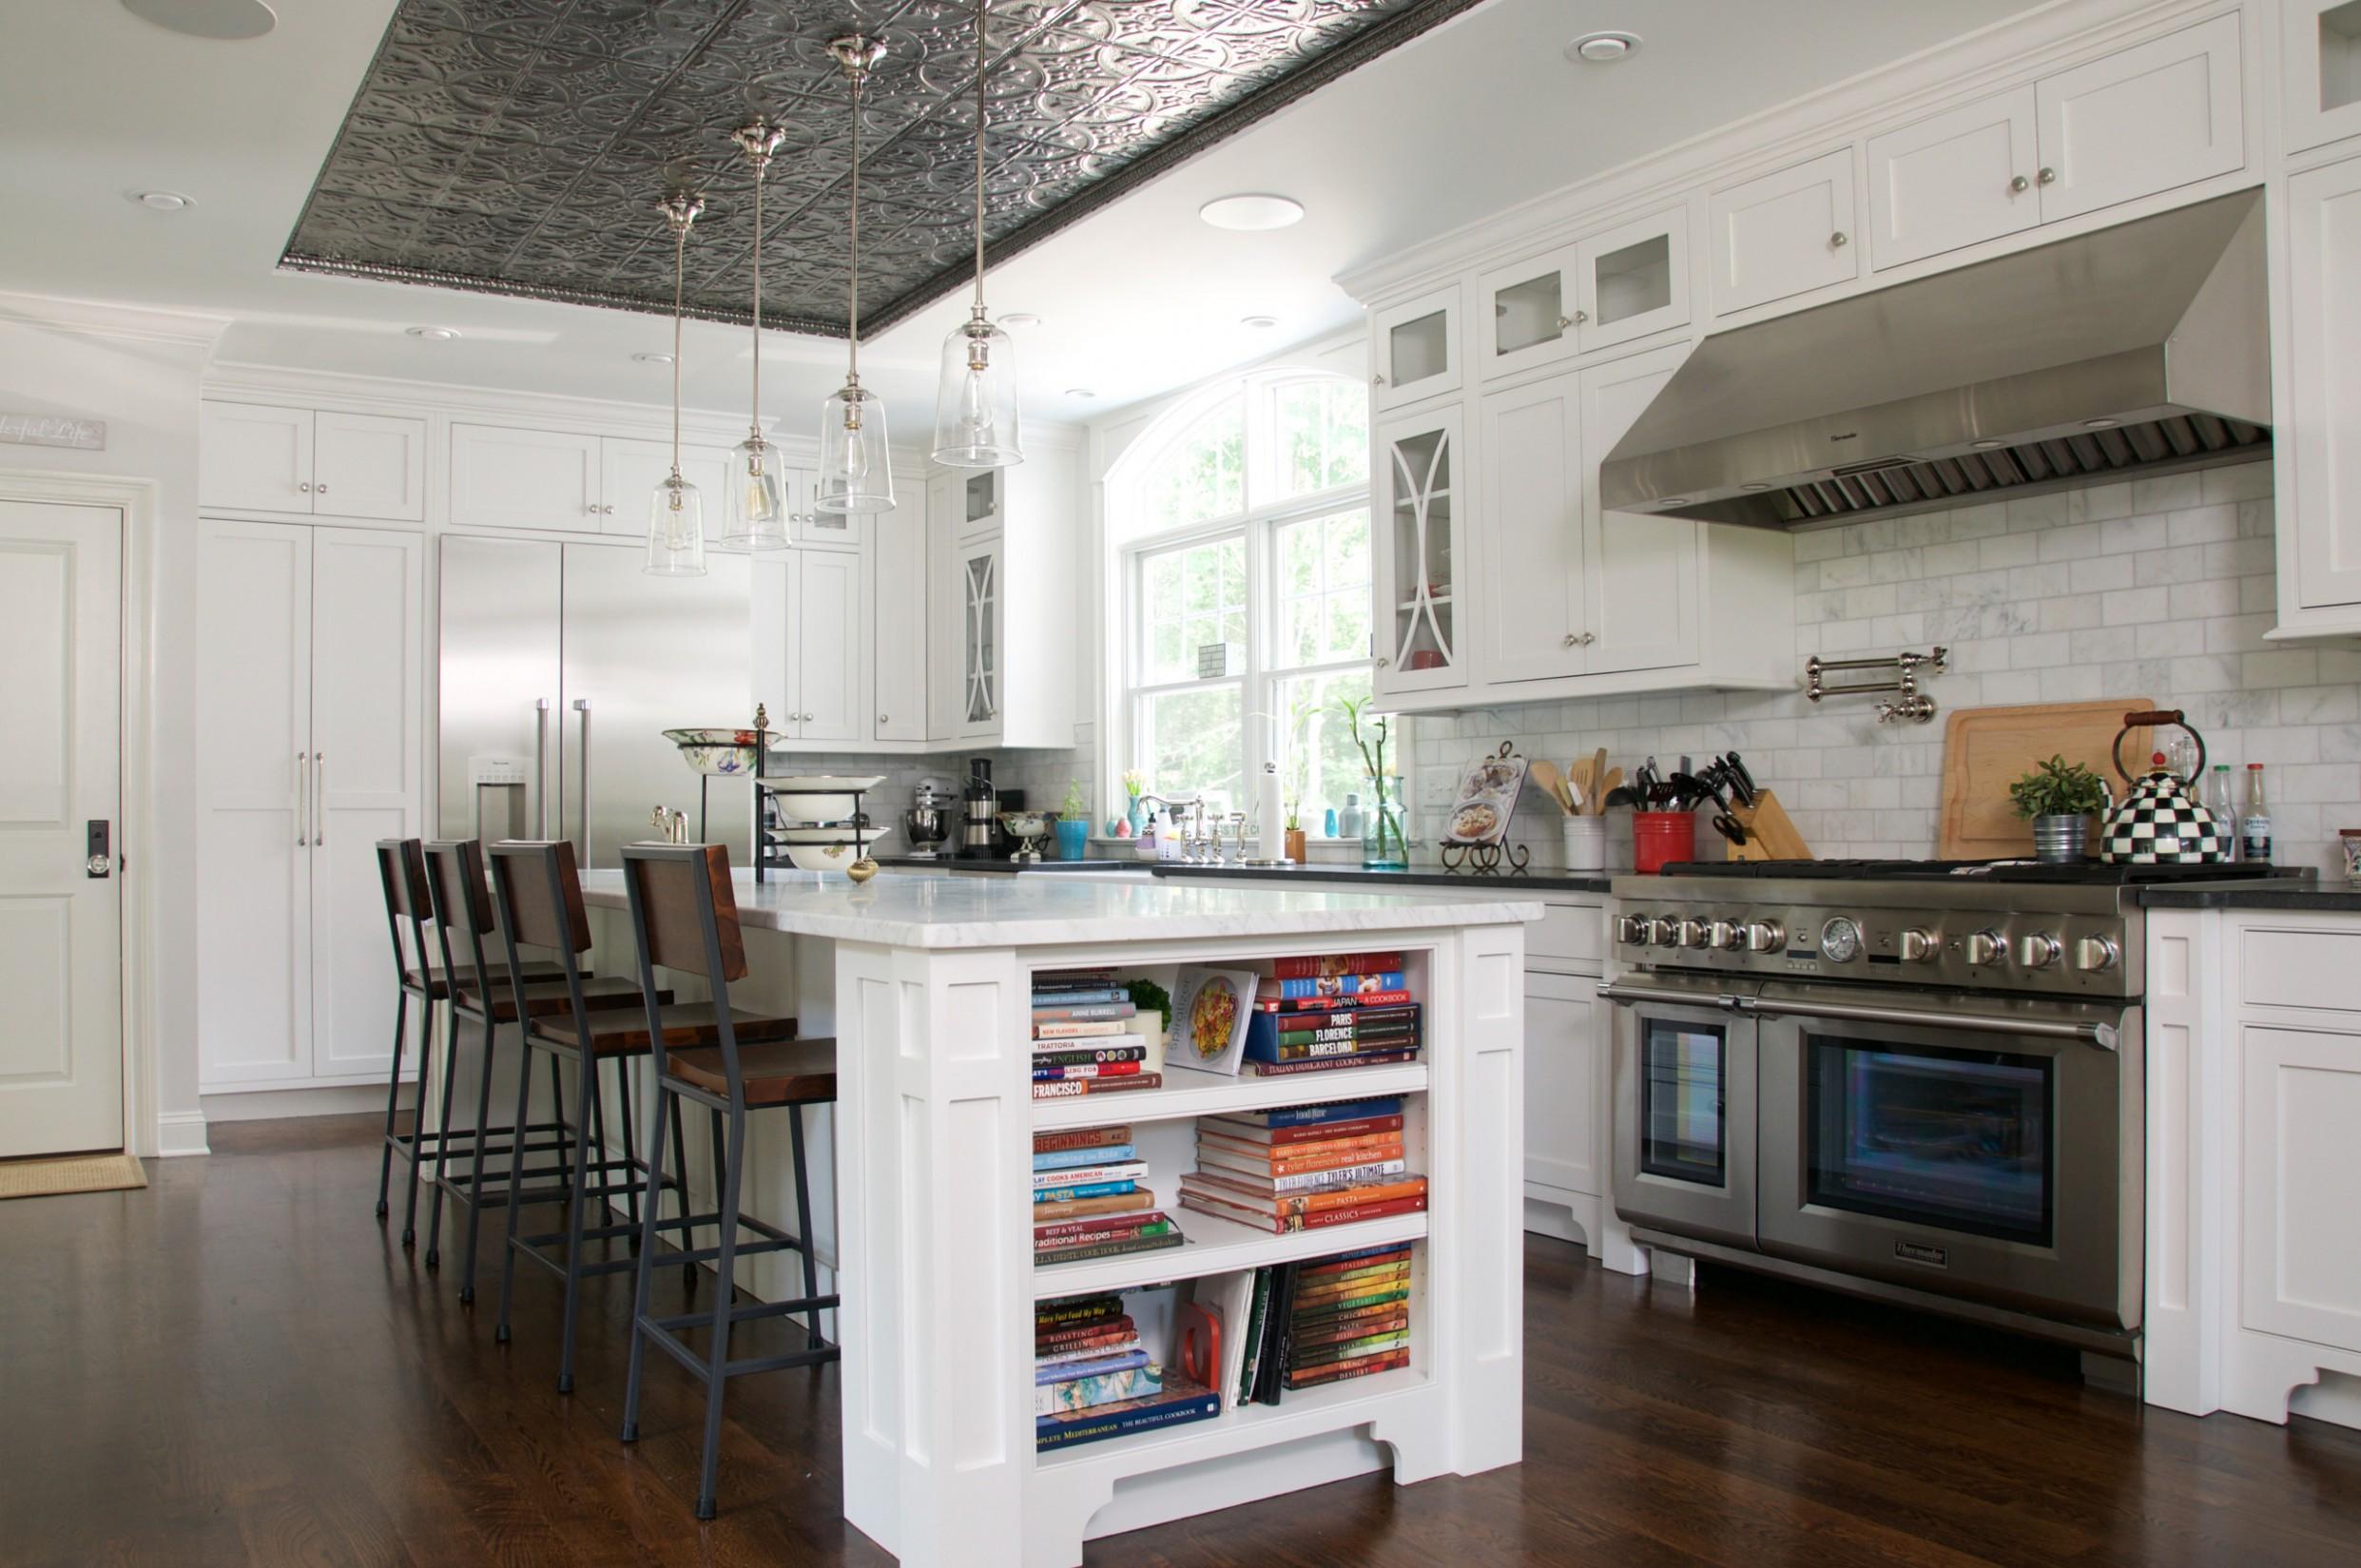 9 Beautiful Kitchen Pictures & Ideas - November, 9  Houzz - Bedroom Kitchen Ideas